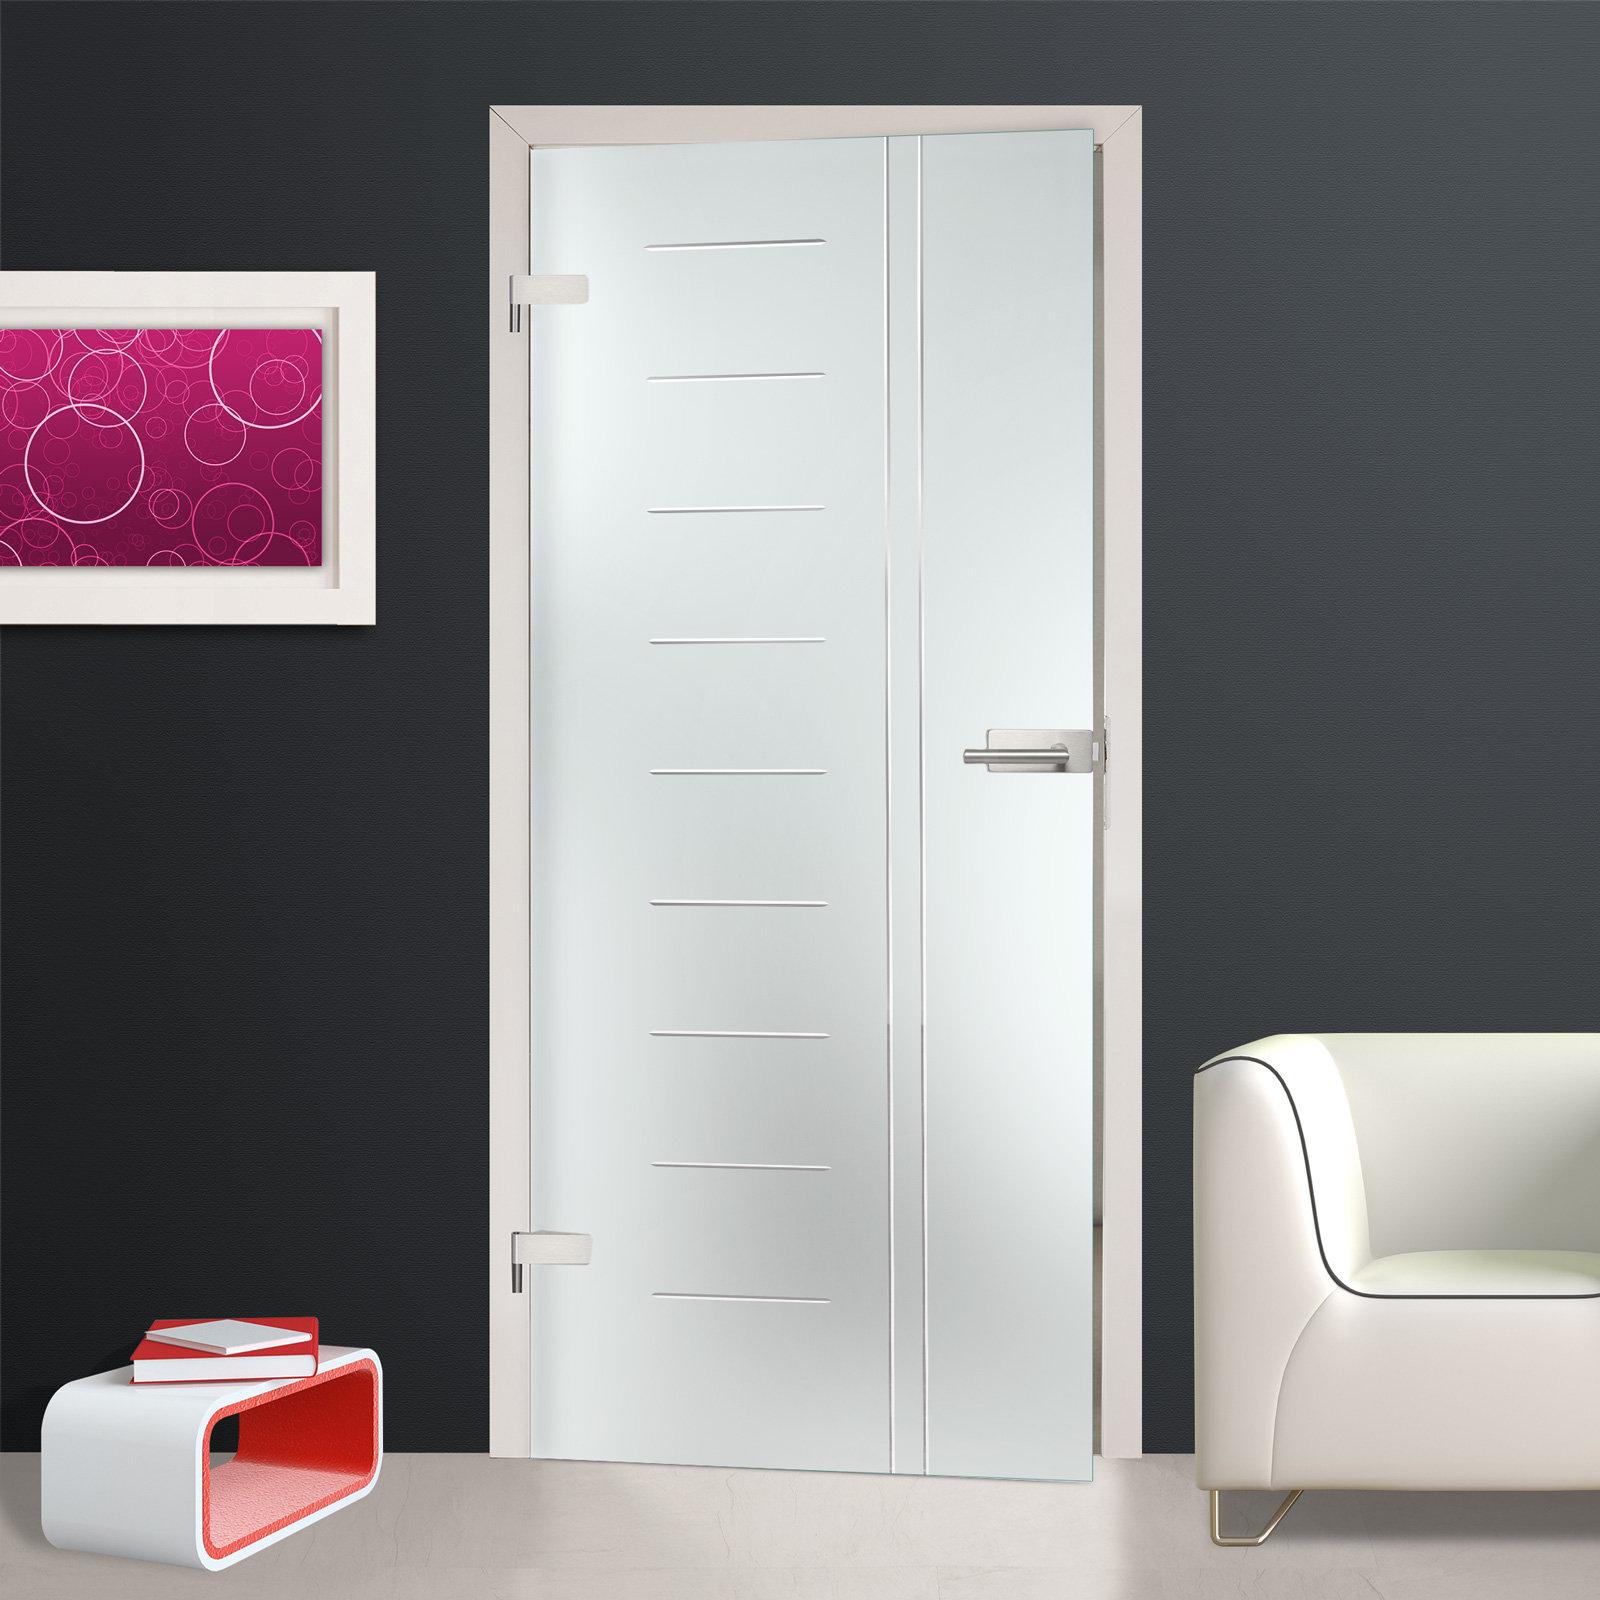 glast r ganzglast r innent r egr2009 restposten 834 x 1972 mm din links ebay. Black Bedroom Furniture Sets. Home Design Ideas